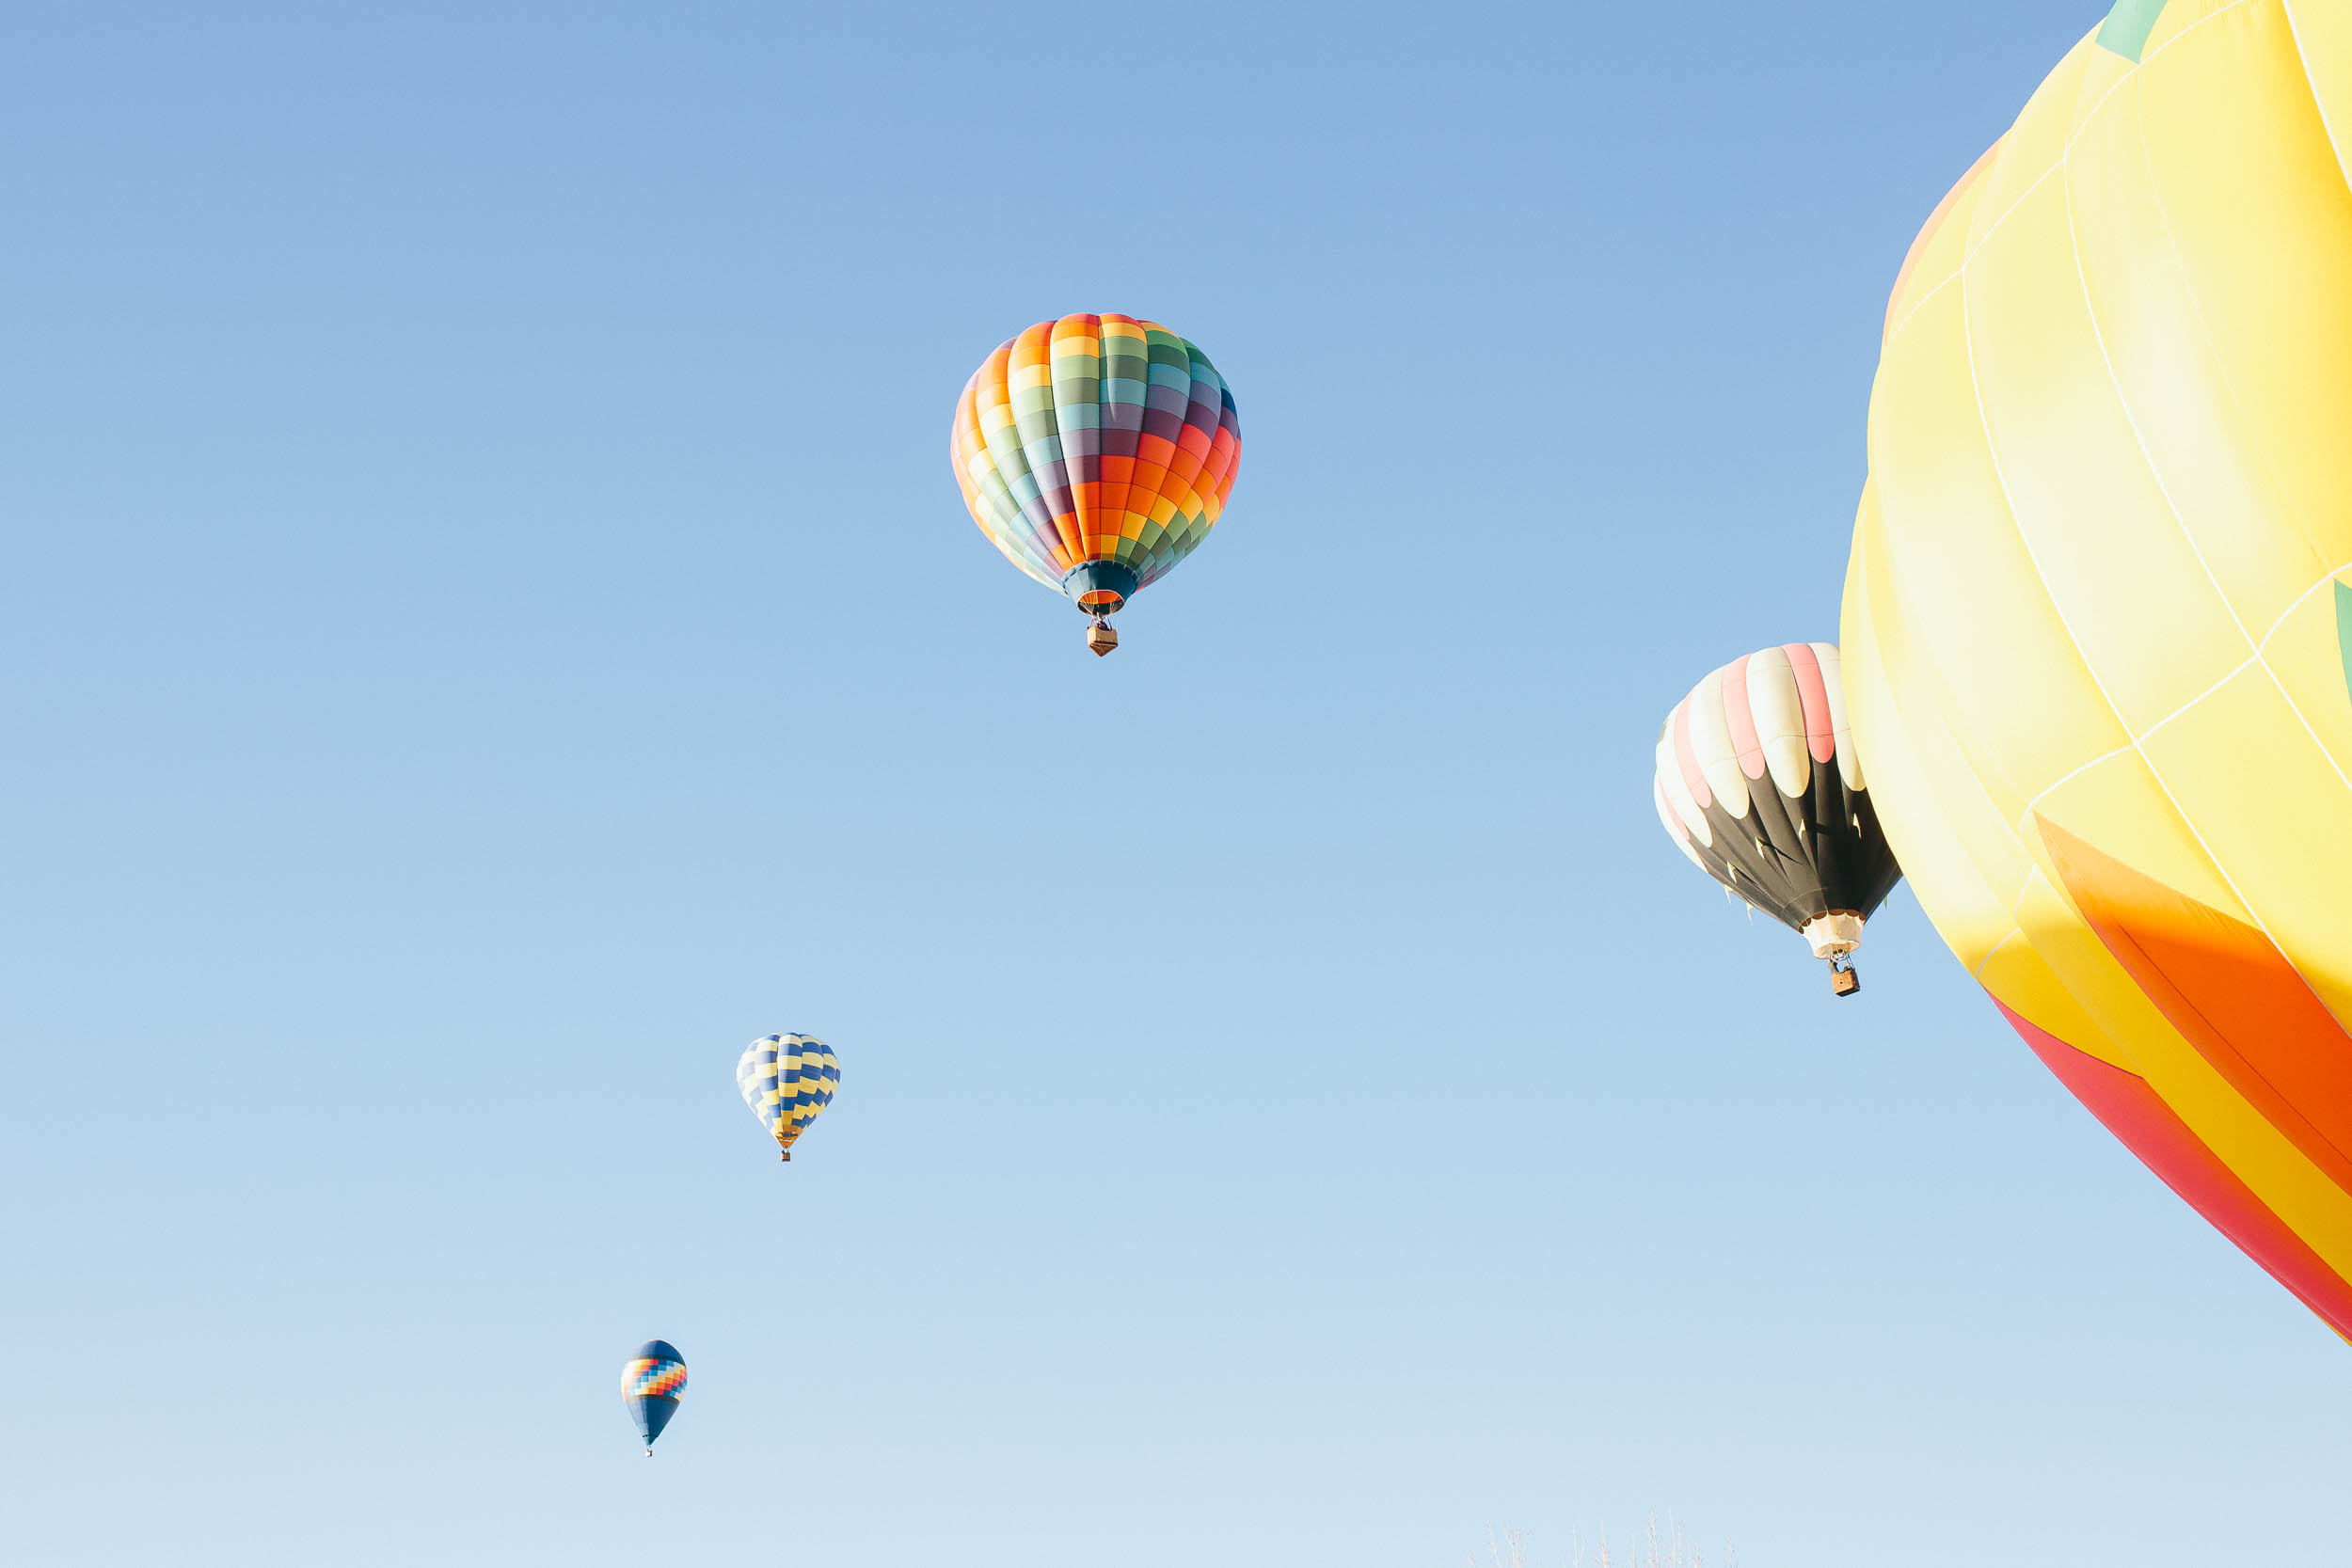 Kyle-Sheppard-Kanab-Balloon-Festival-15.jpg